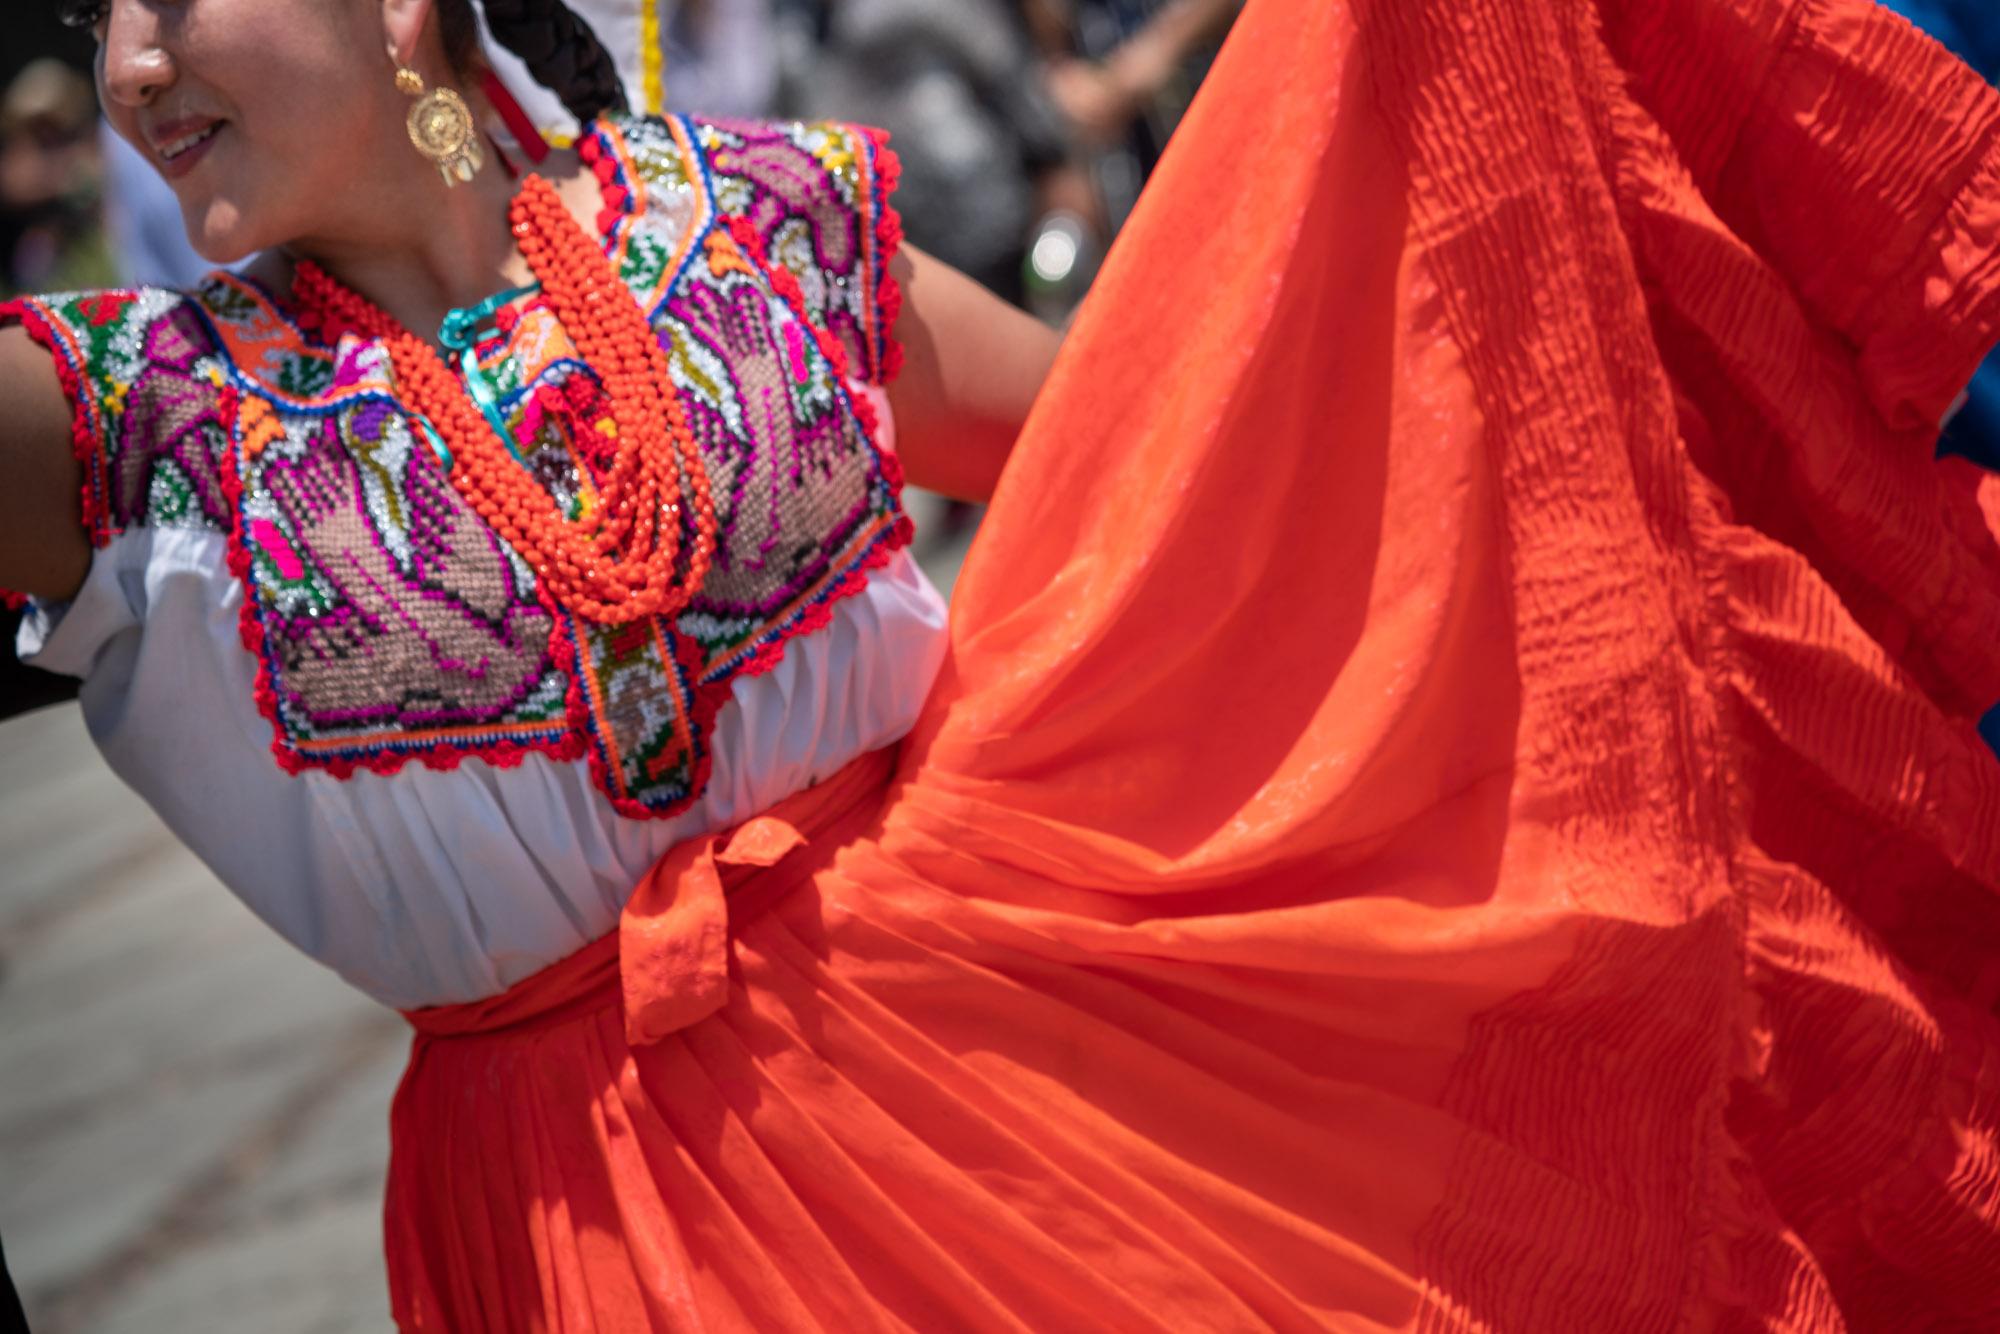 Dancer embraces color, Oaxaca_DSC1558.jpg